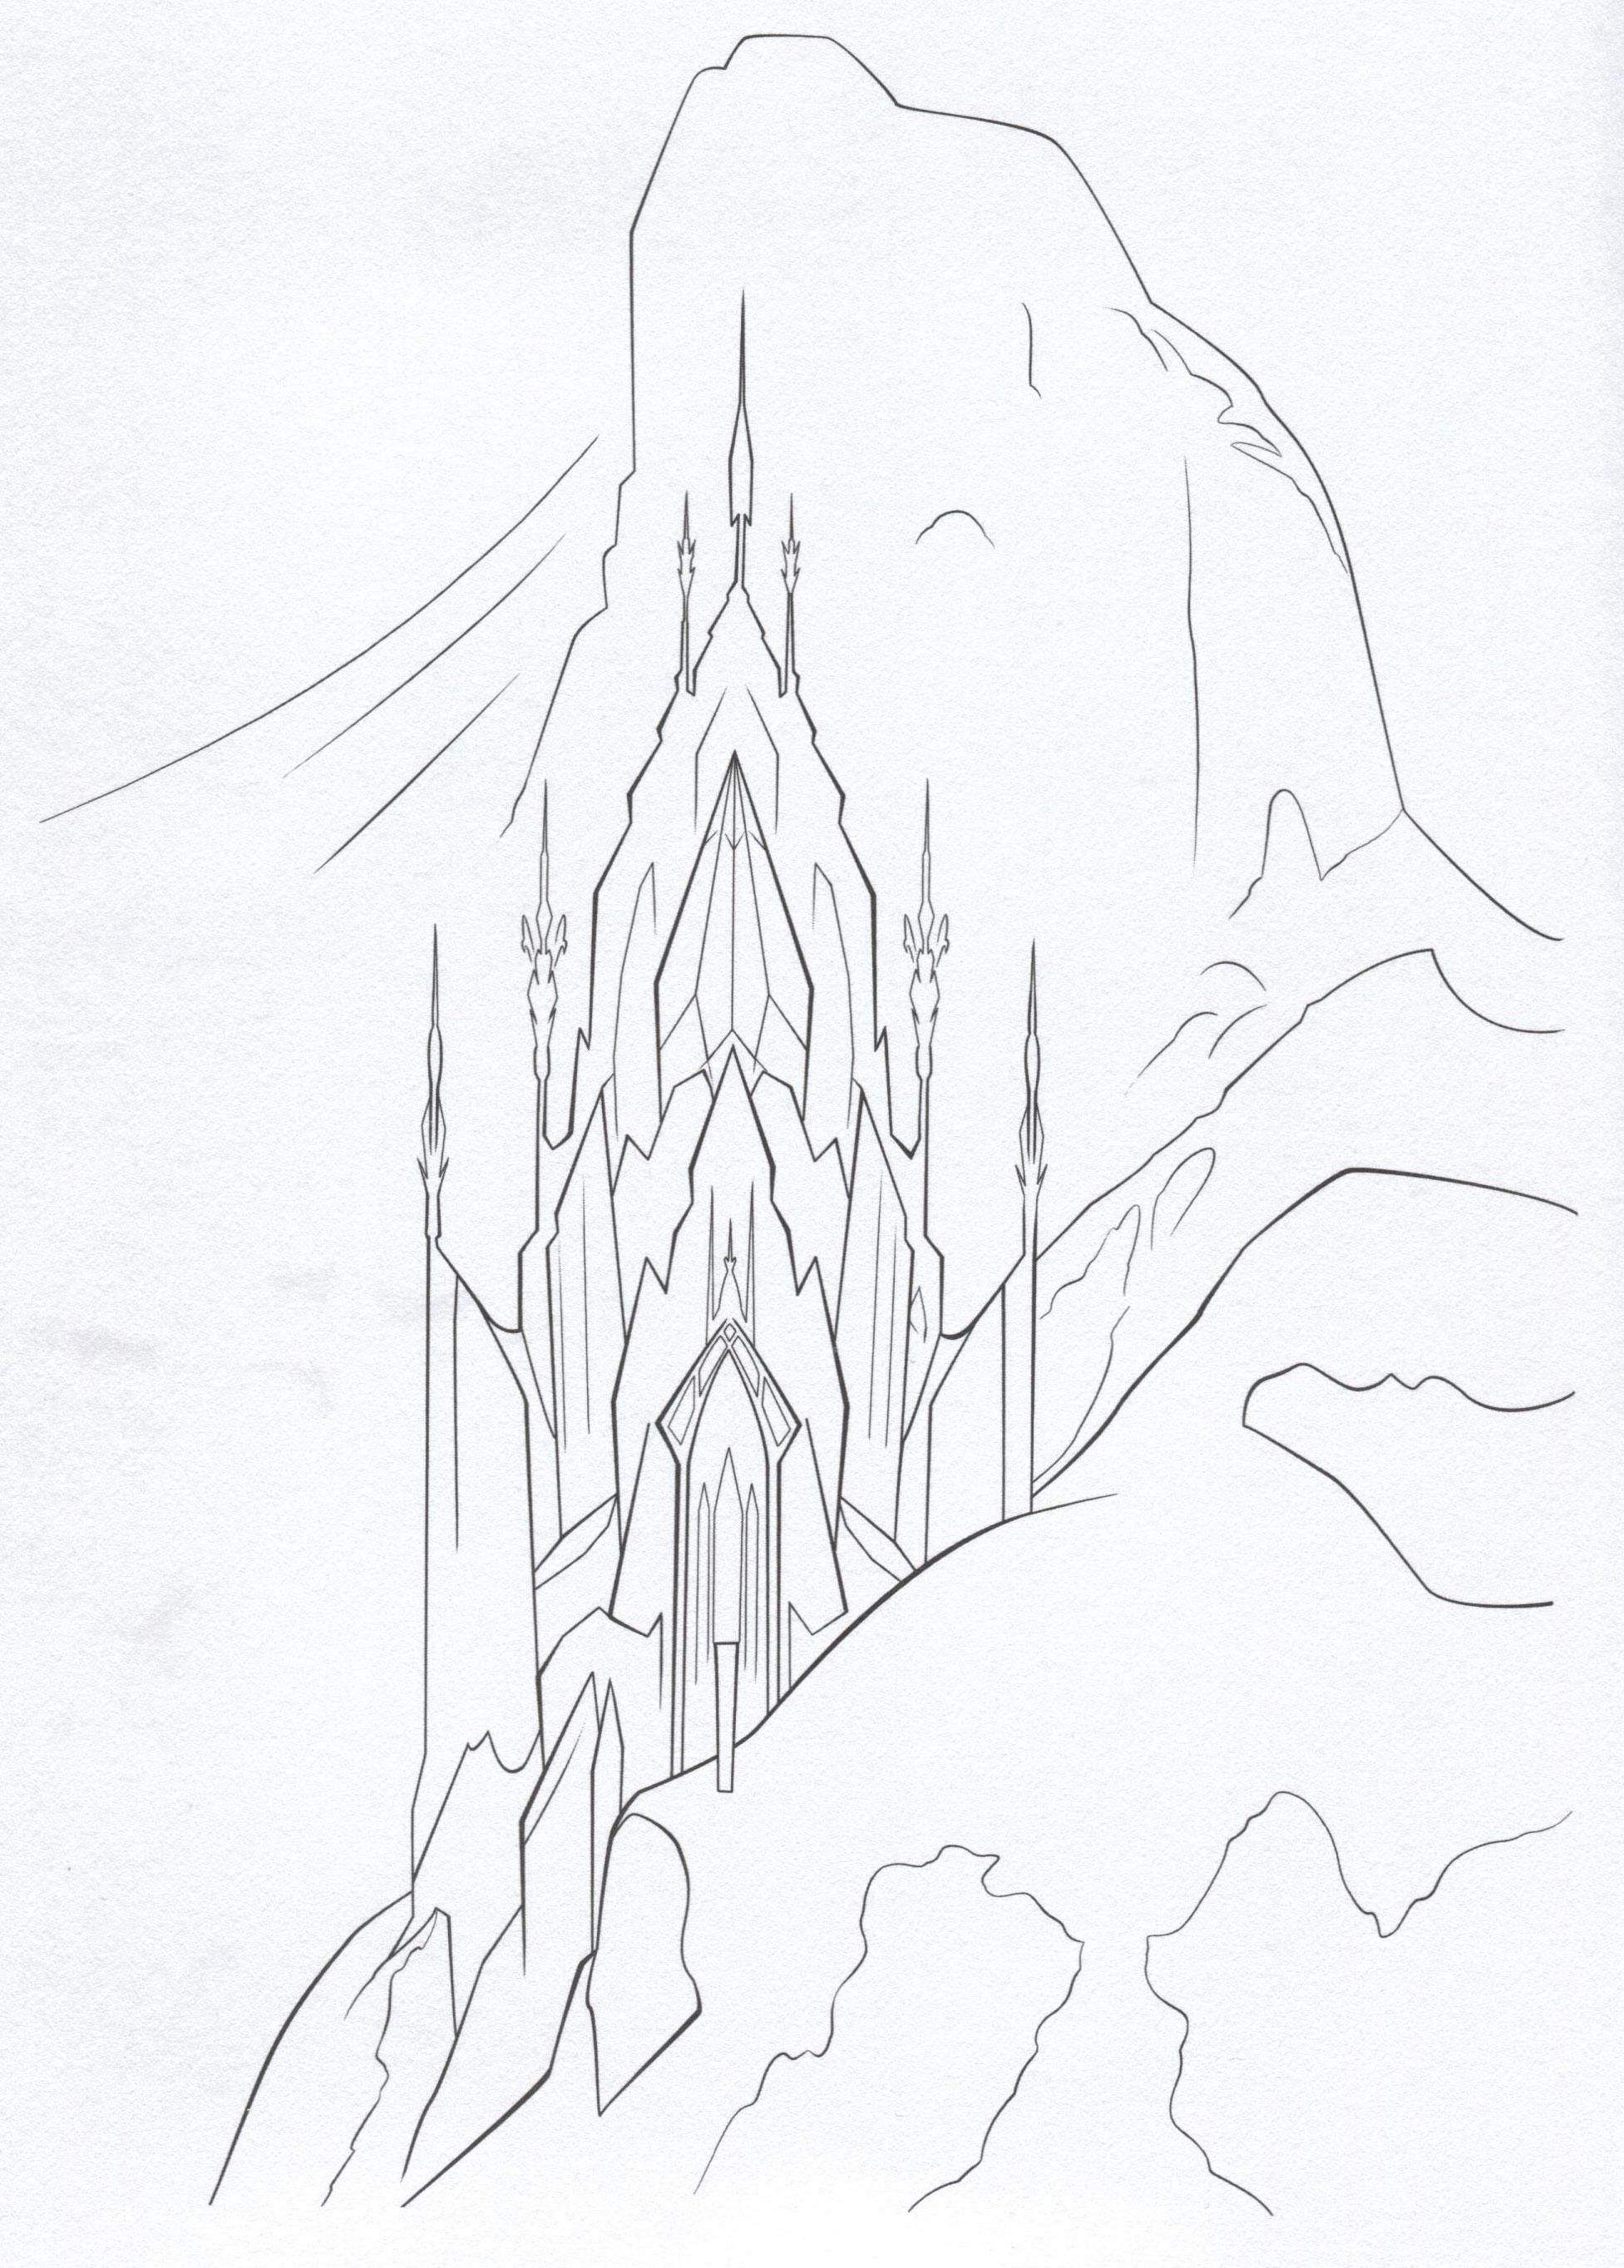 desenho de castelo de gelo da elsa para colorir tudodesenhos